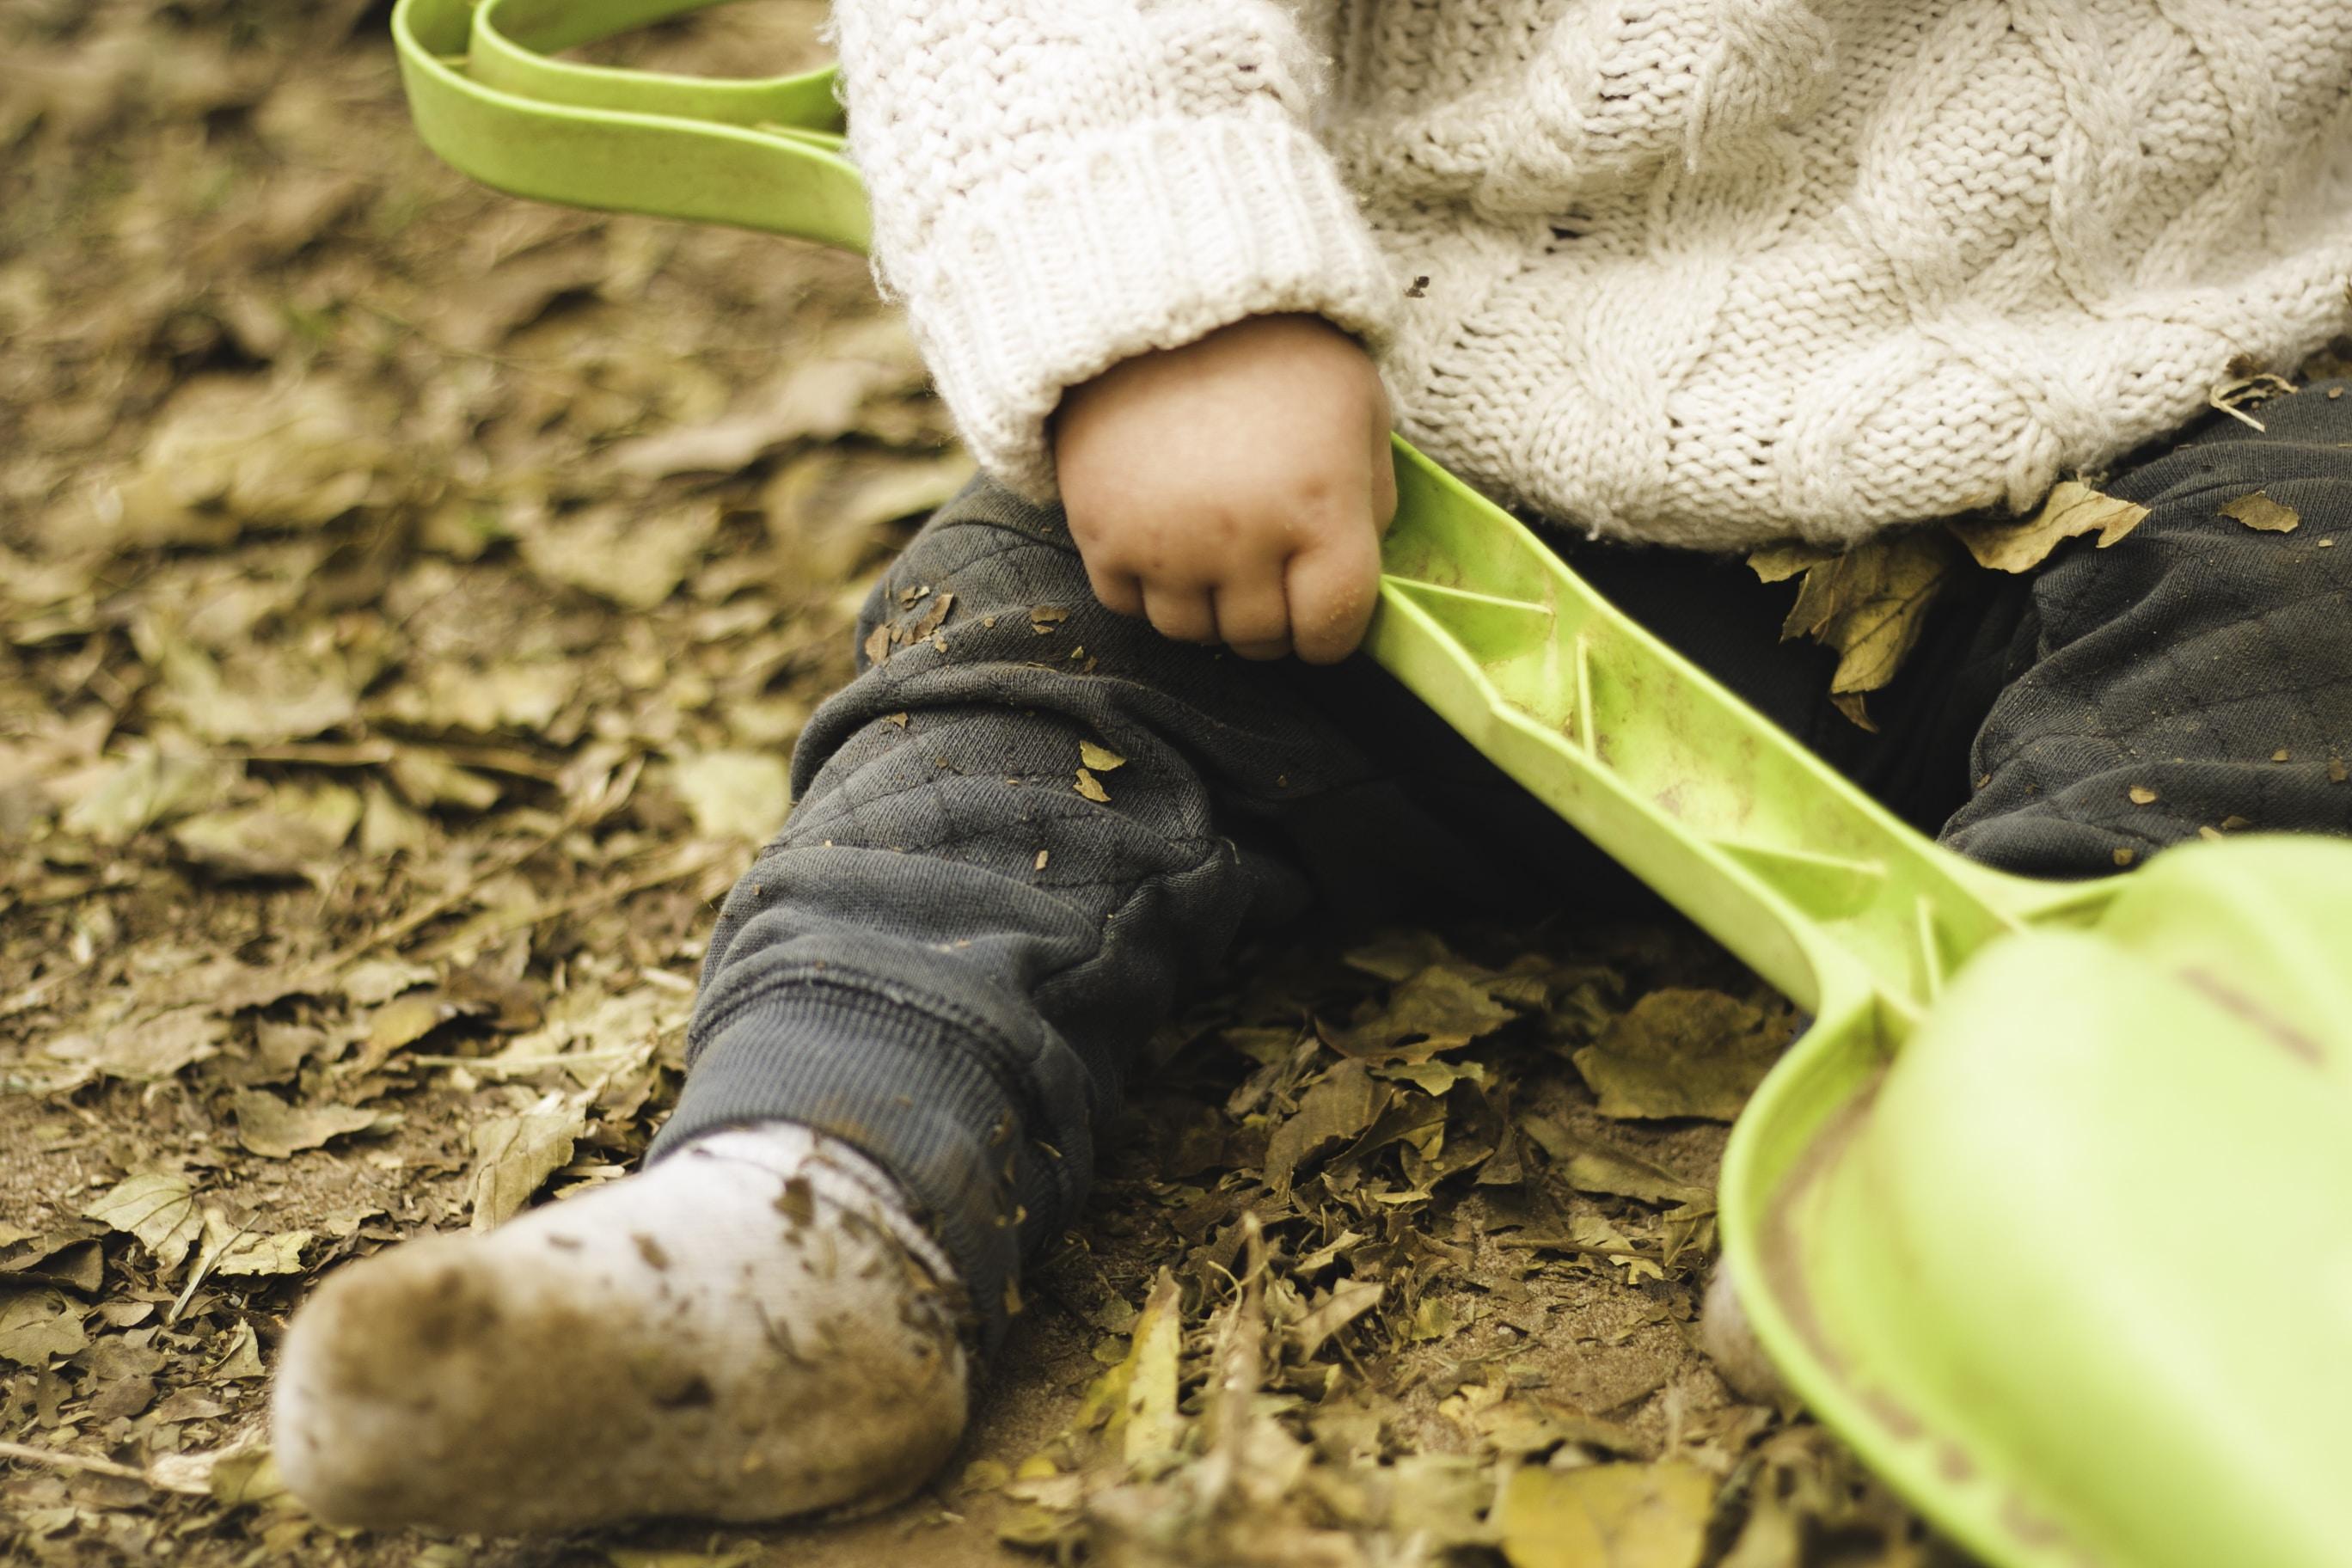 child holding green plastic shovel toy